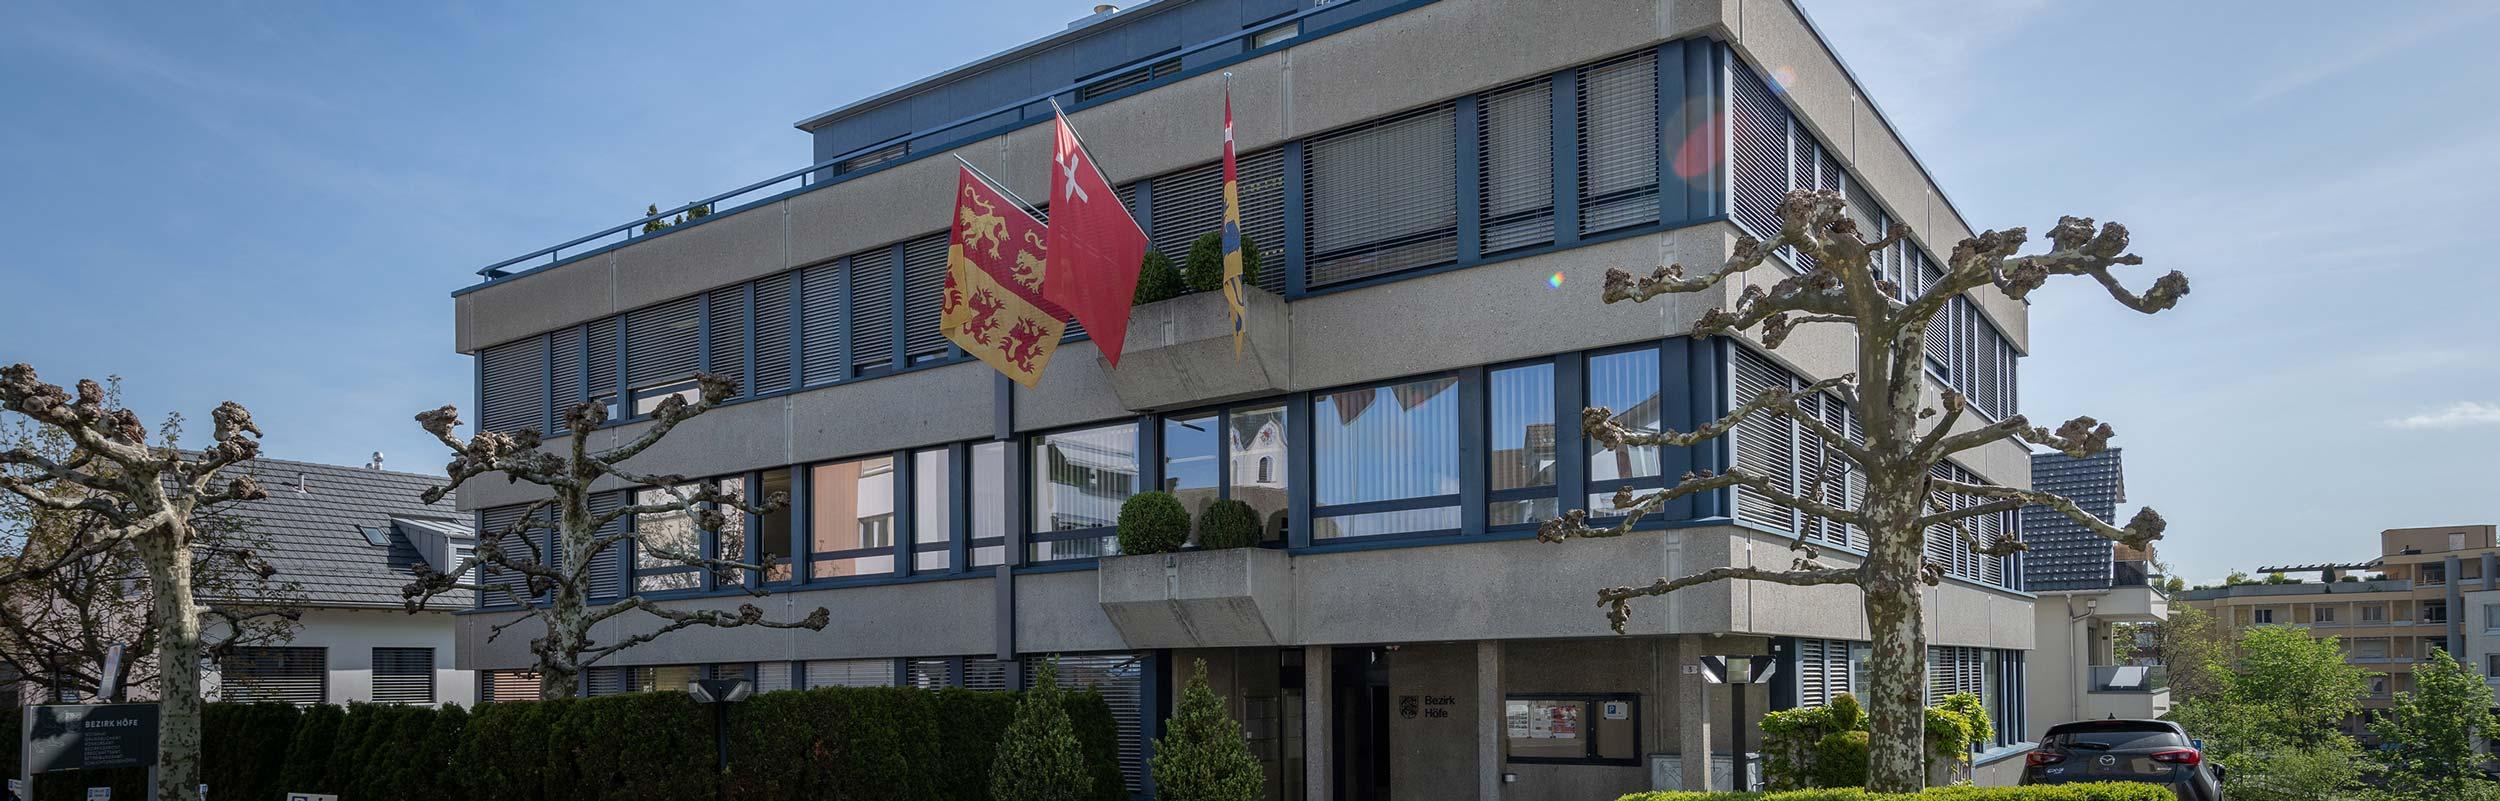 Rathaus1_Roosstrasse3_web2